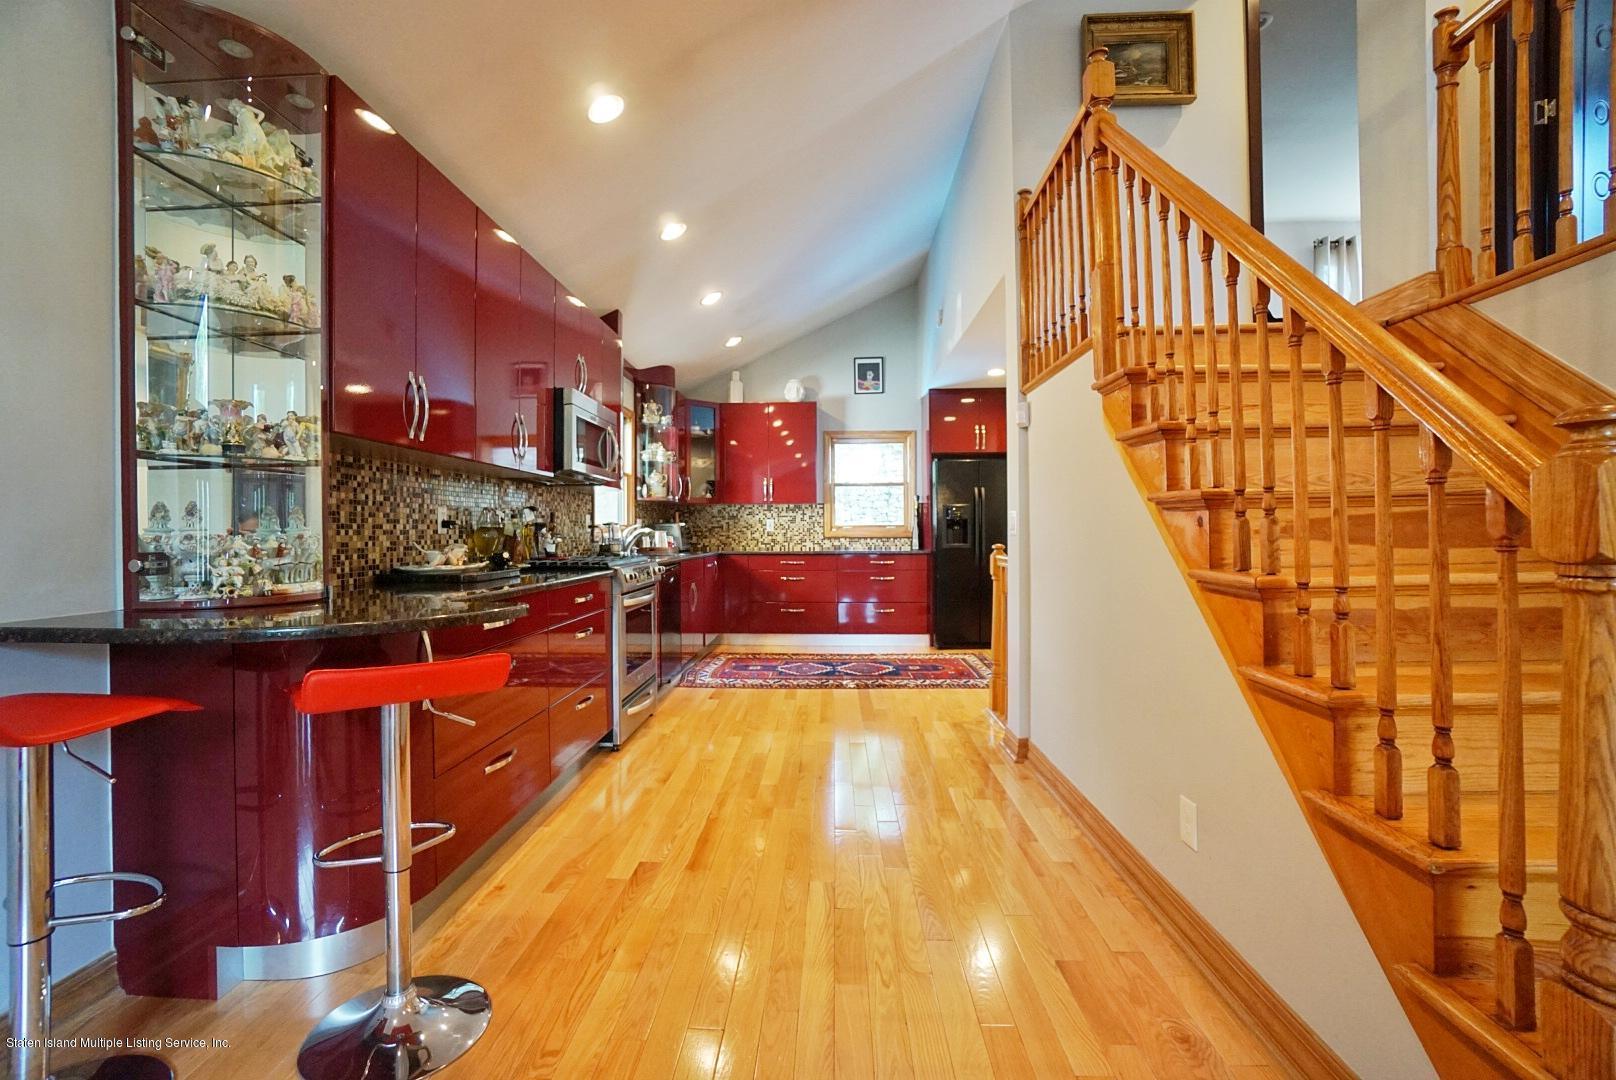 Single Family - Detached 48 Ocean Terrace  Staten Island, NY 10314, MLS-1130826-19